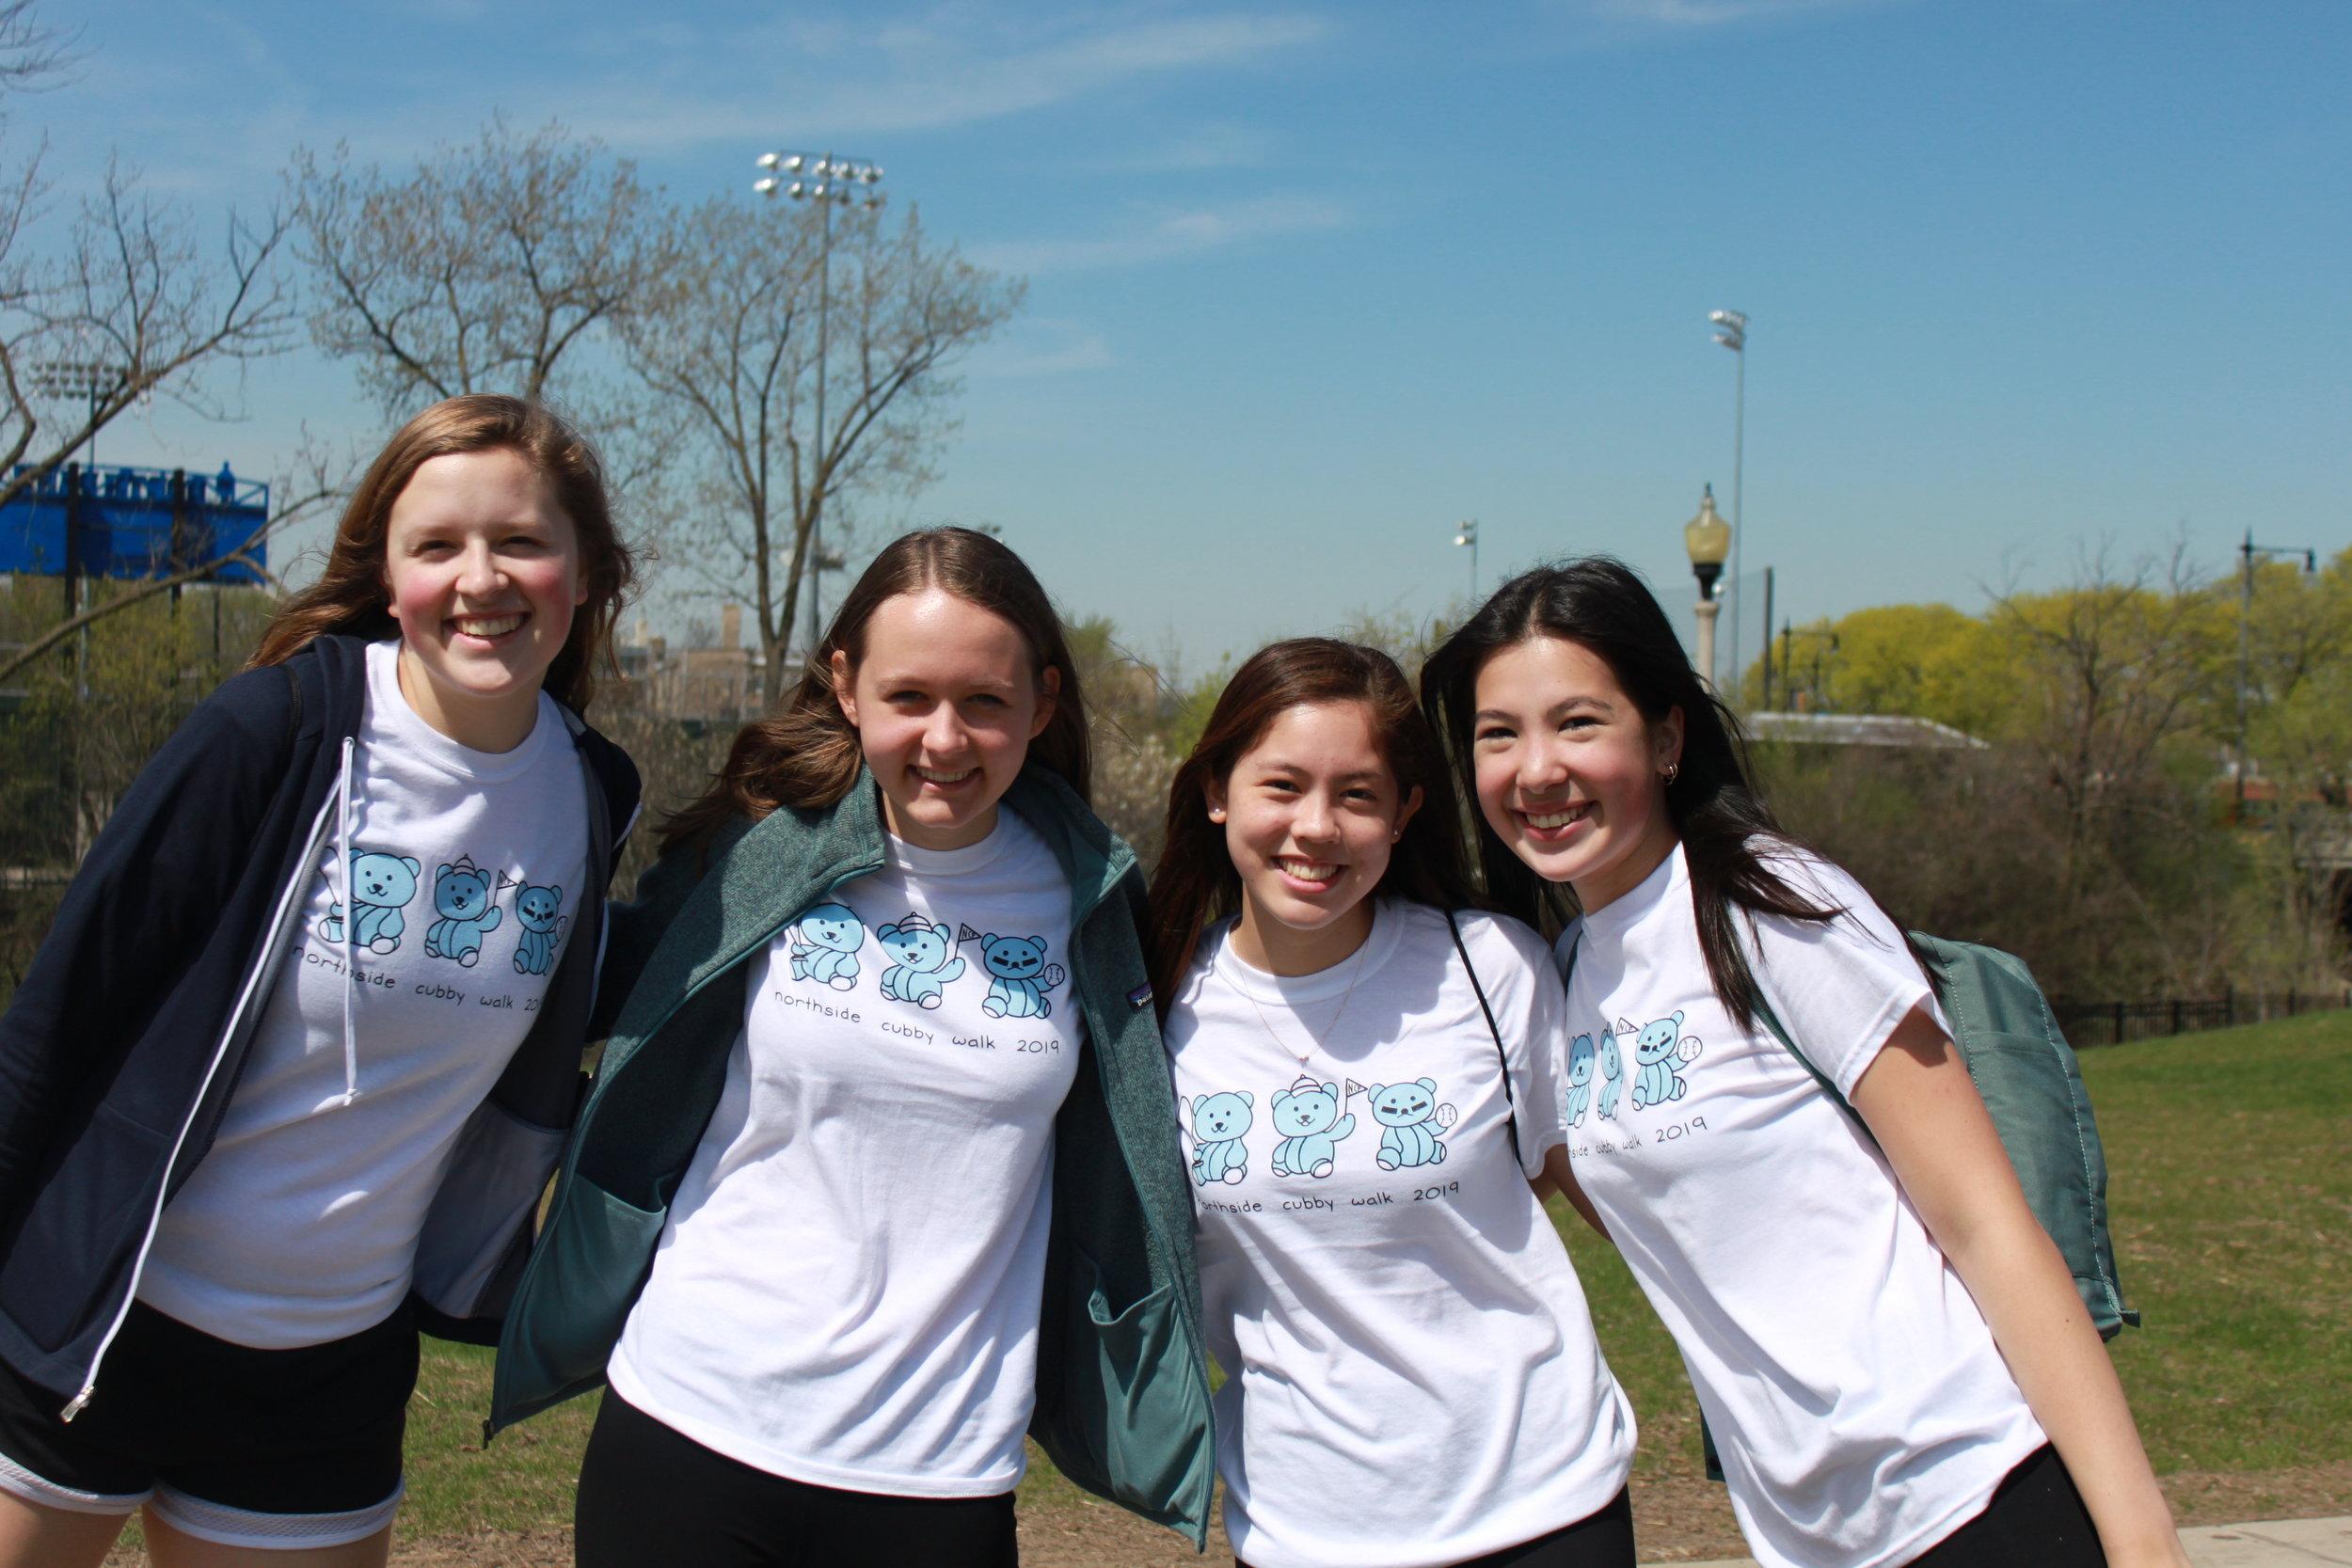 Junior participants show off their Cubby Walk shirts